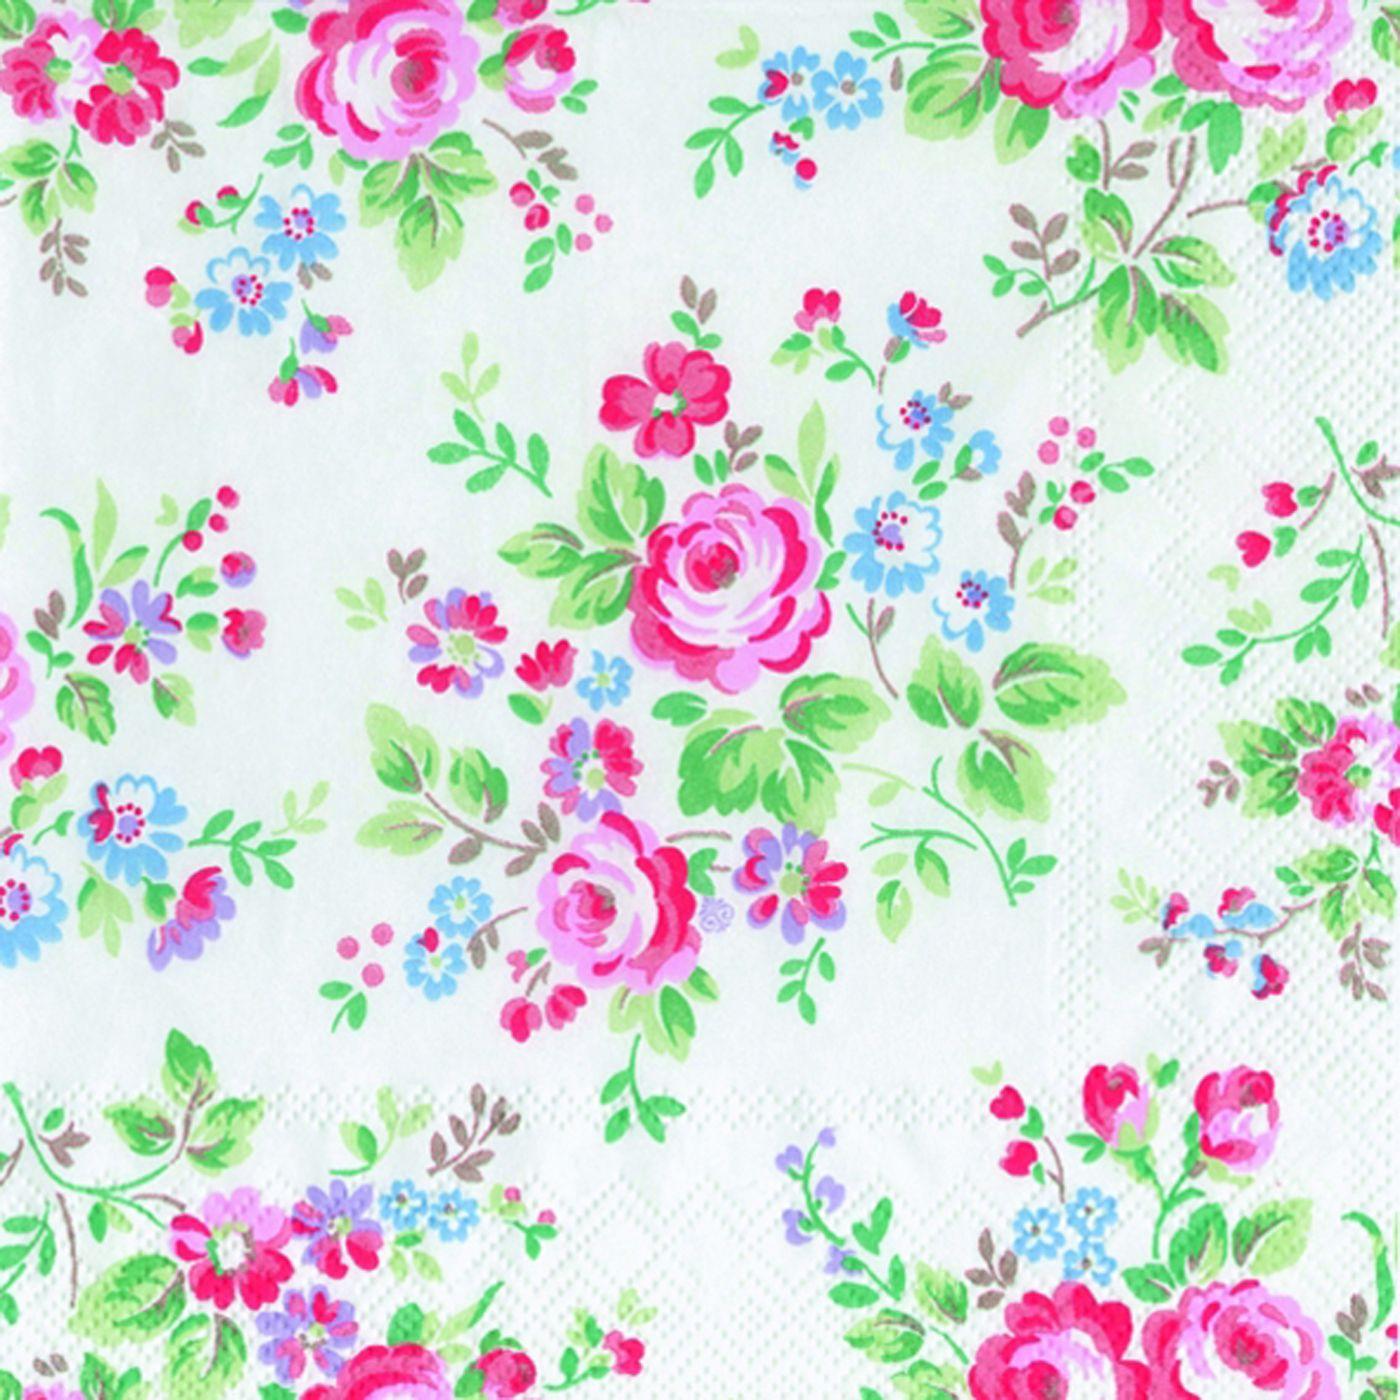 Roses Flower Floral Pattern Chelsea Roses Cath Kidston